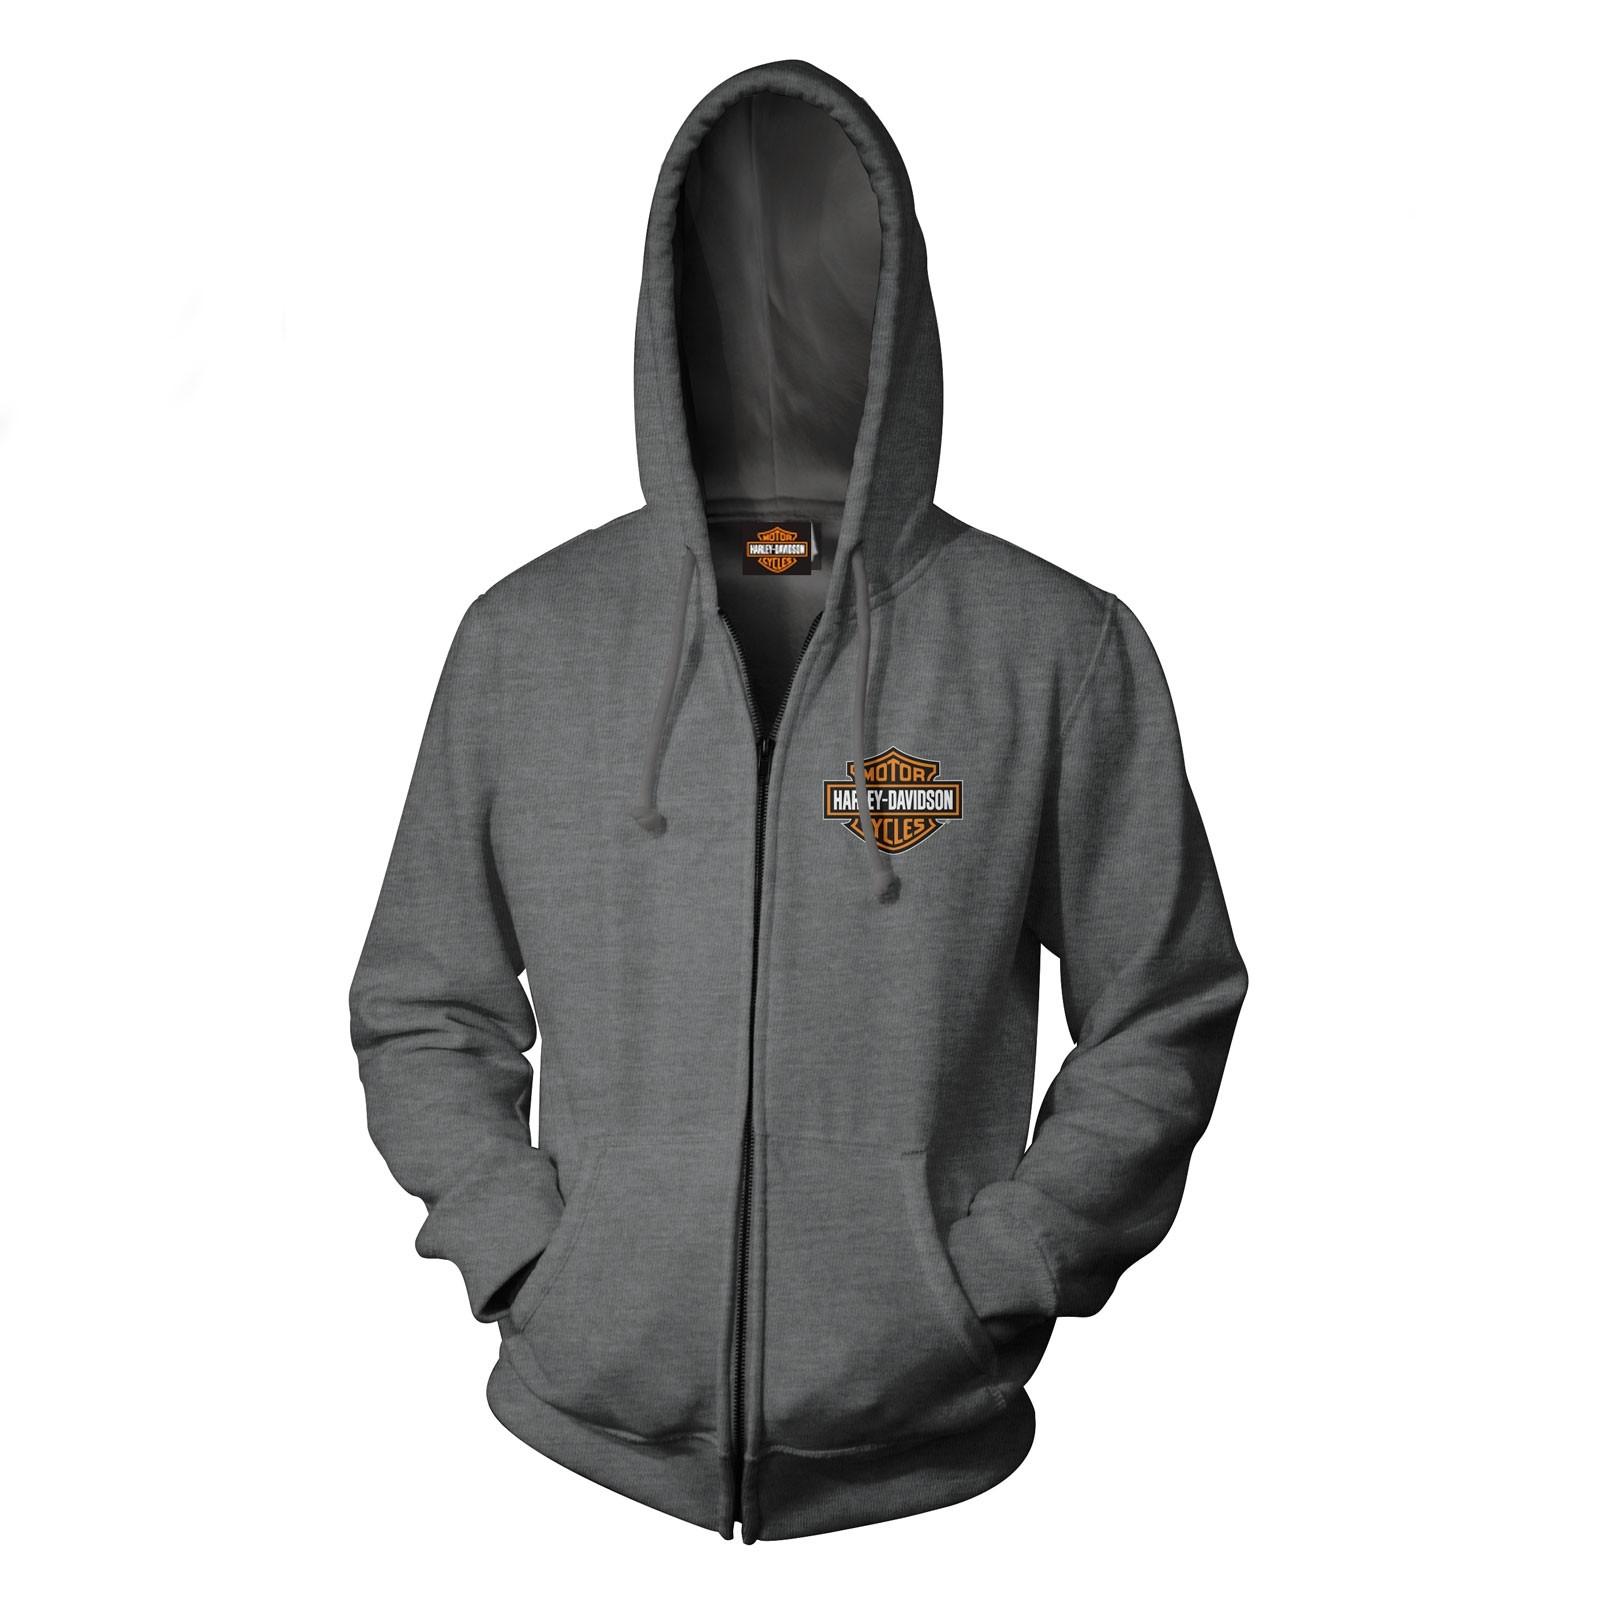 Men's Dark Heather Bar & Shield Graphic Zip Hoodie Sweatshirt - Overseas Tour | Military Skull Text